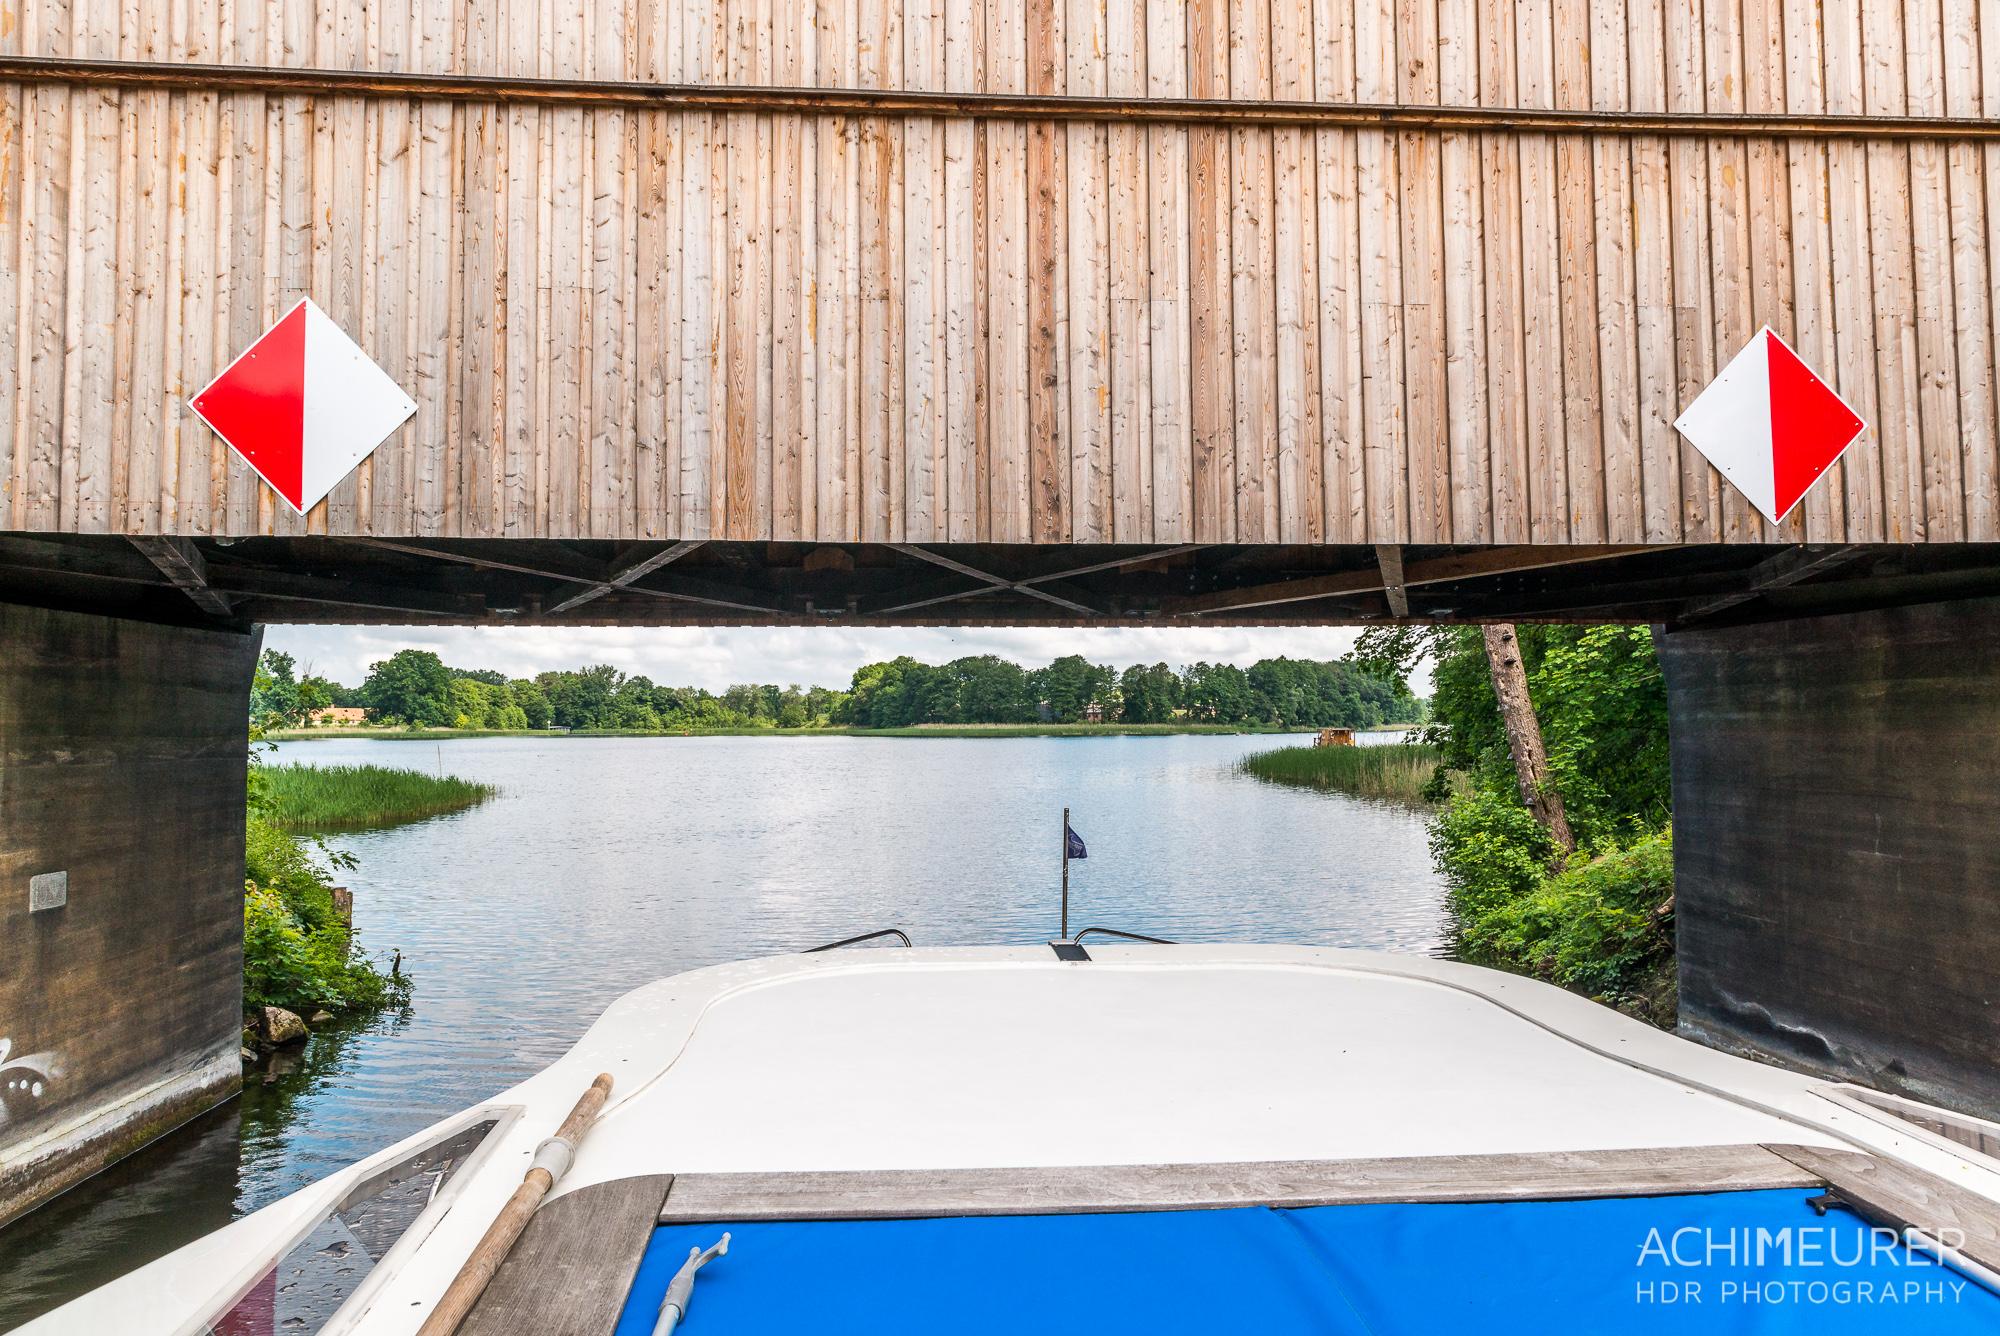 Hausboot-Kuhnle-Mueritz-Mecklenburg-Vorpommern-See_2888